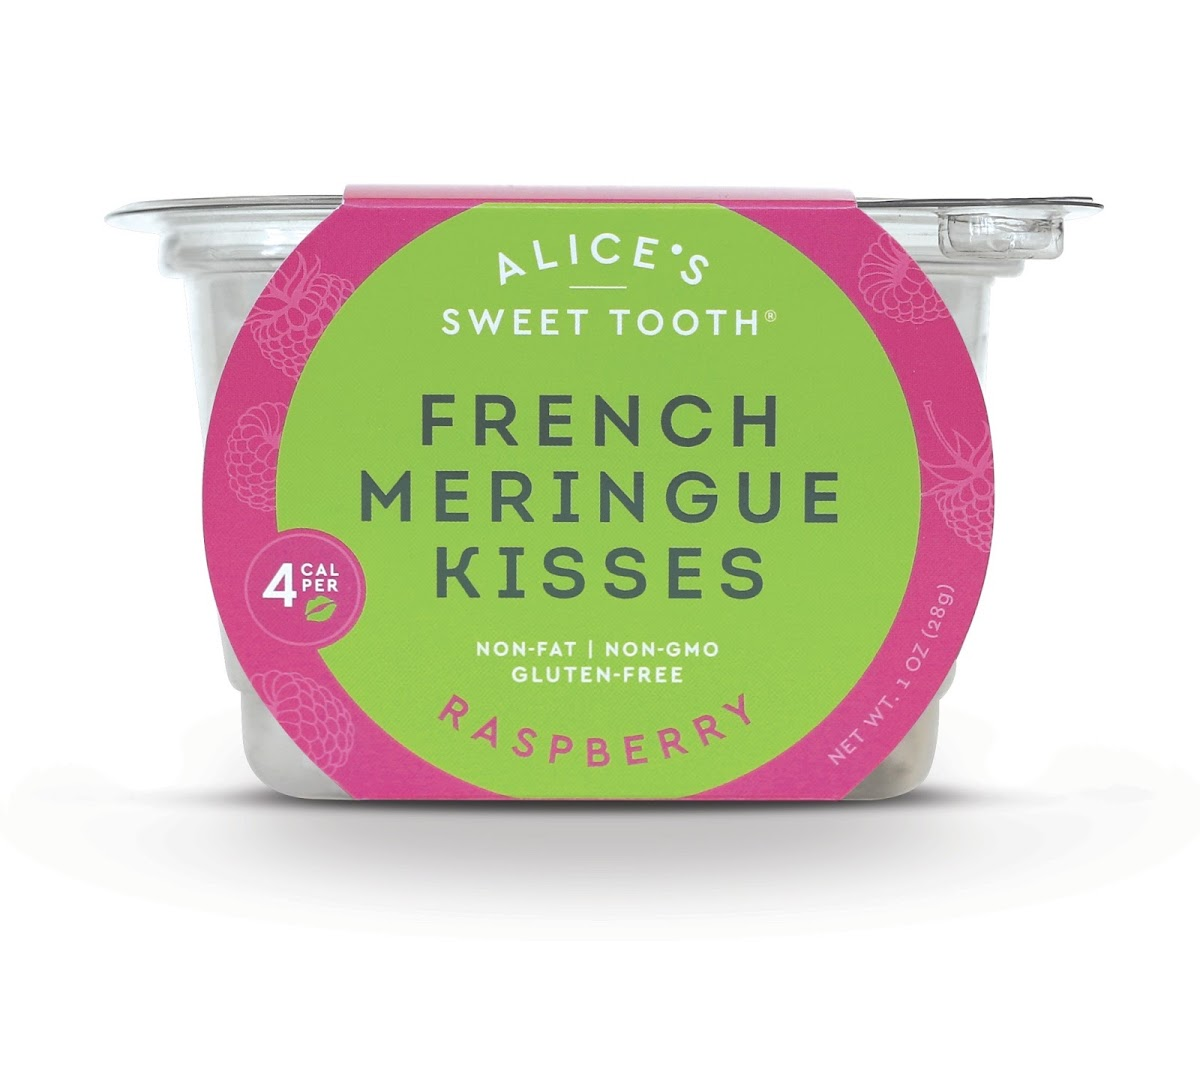 French Meringue Kisses - Raspberry